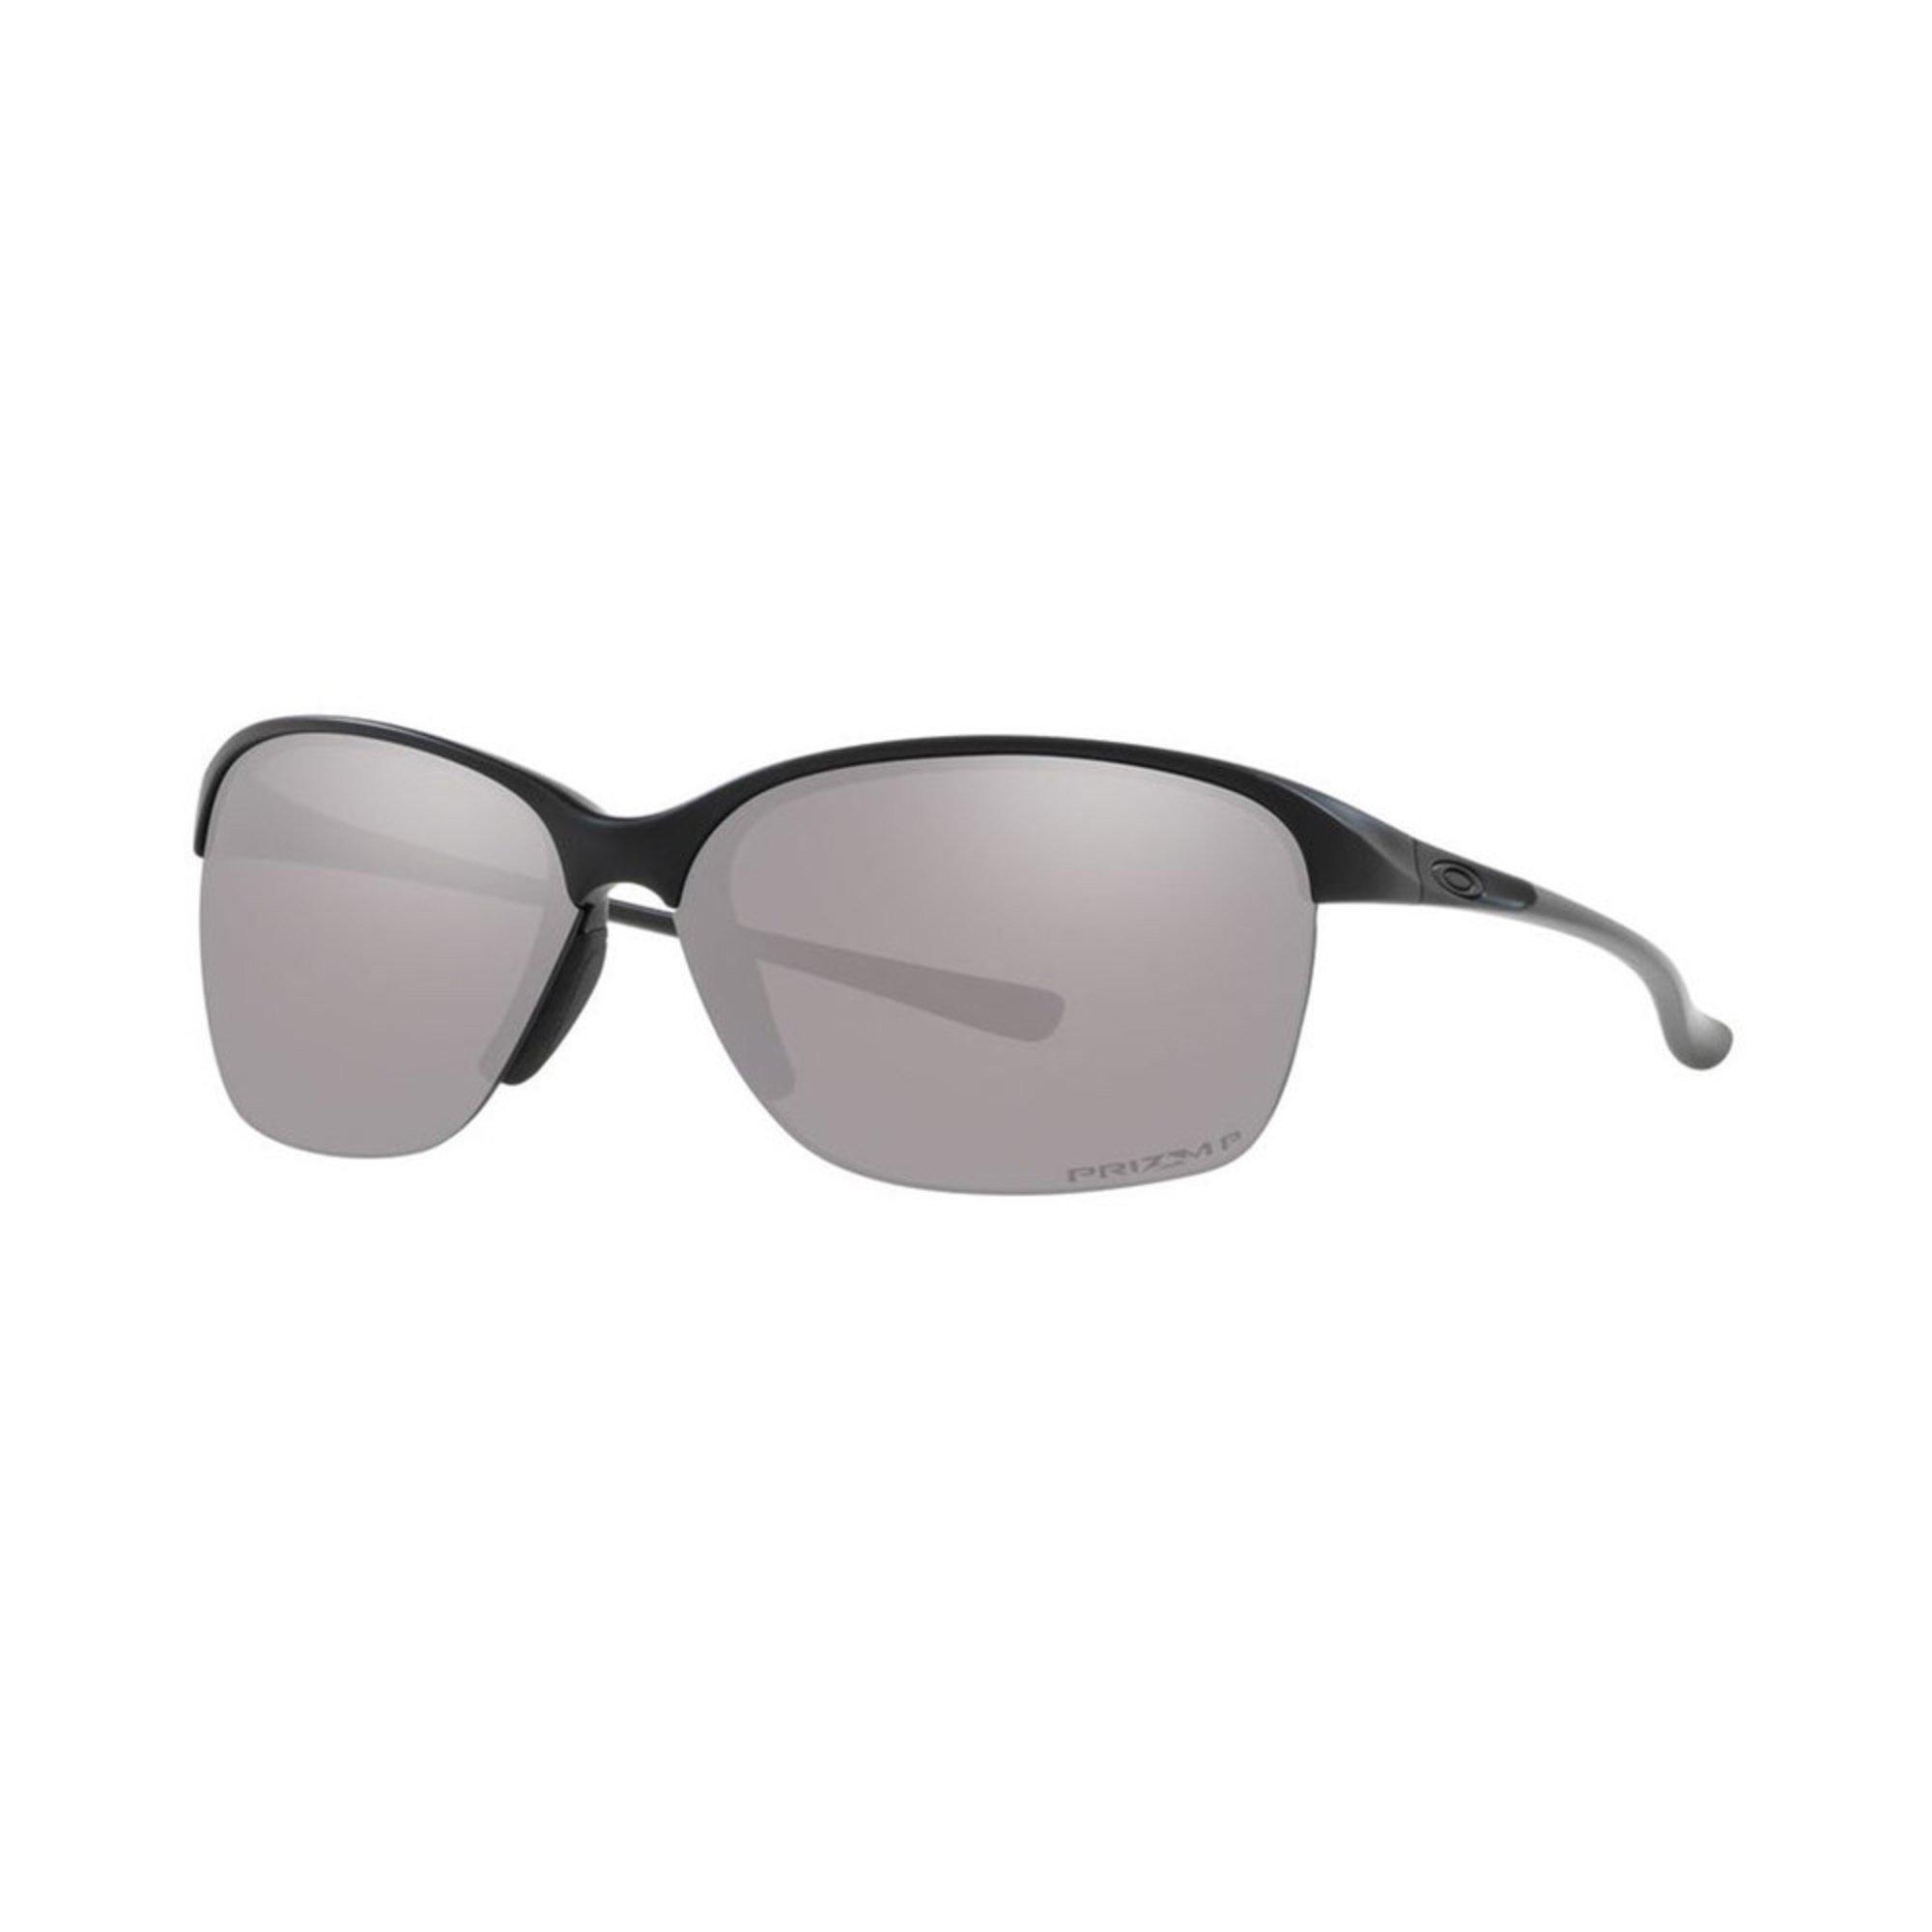 e98855d9d3 Oakley. Oakley Women s Polarized SI Unstoppable Prizm Sunglasses